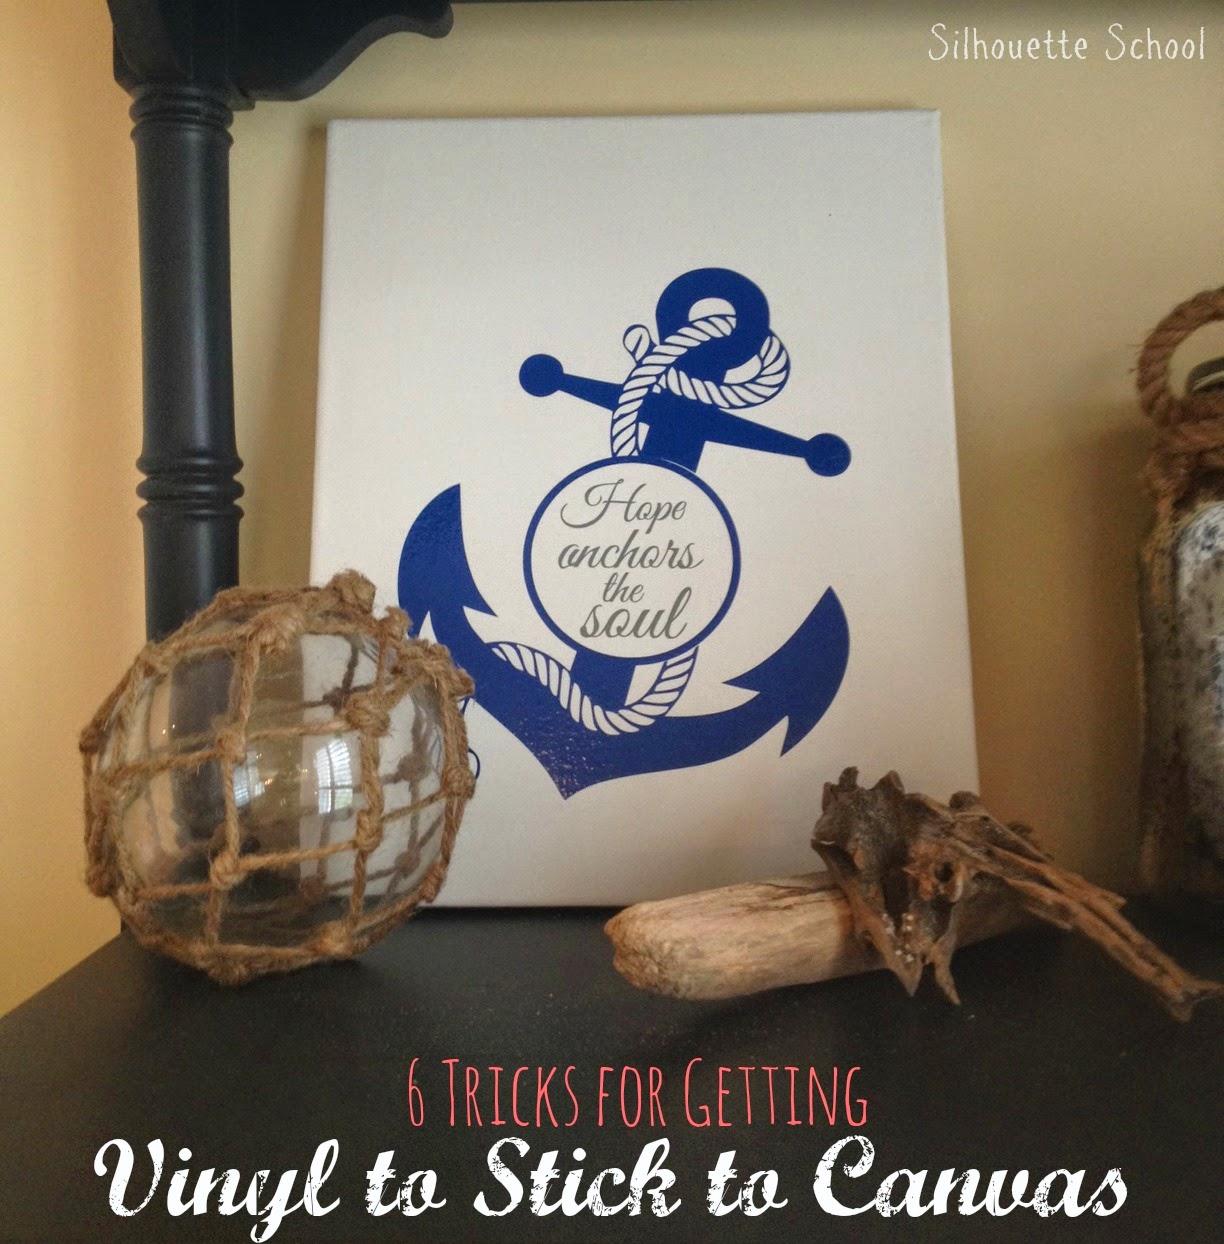 Adhesive vinyl, vinyl adhesive, canvas, silhouette 101, silhouette america blog